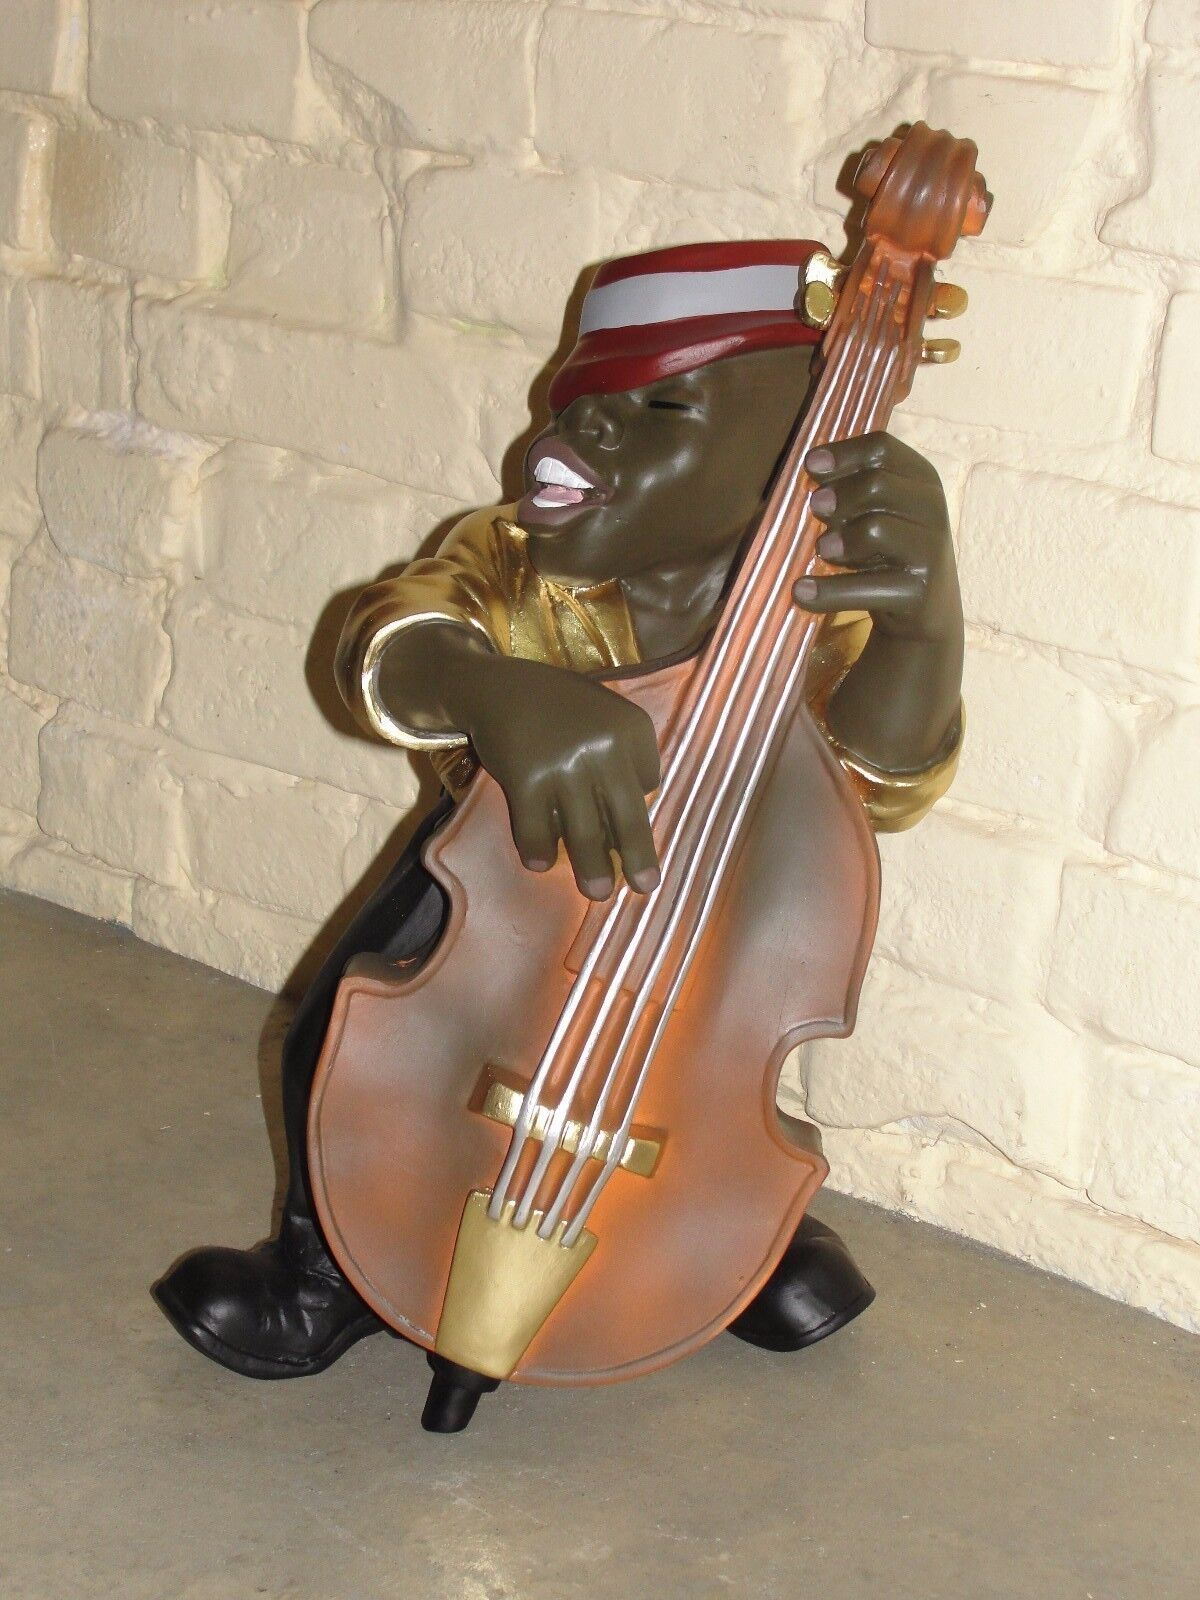 Sänger Bassist Figur Jazz Musiker Skulptur Jazzfigur Afrika  Musik Werbefigur